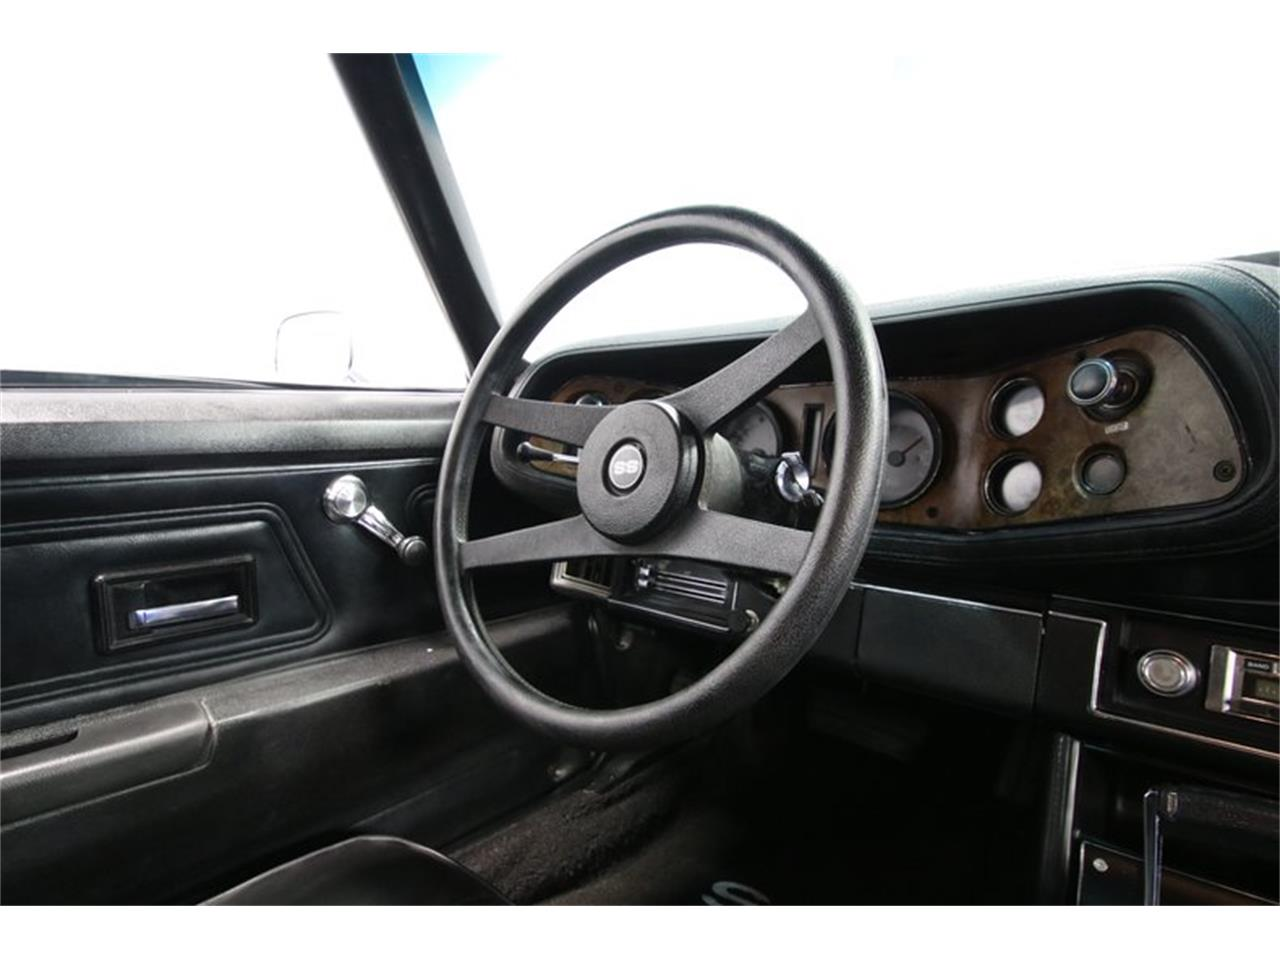 Large Picture of Classic '70 Camaro located in North Carolina - QRKC